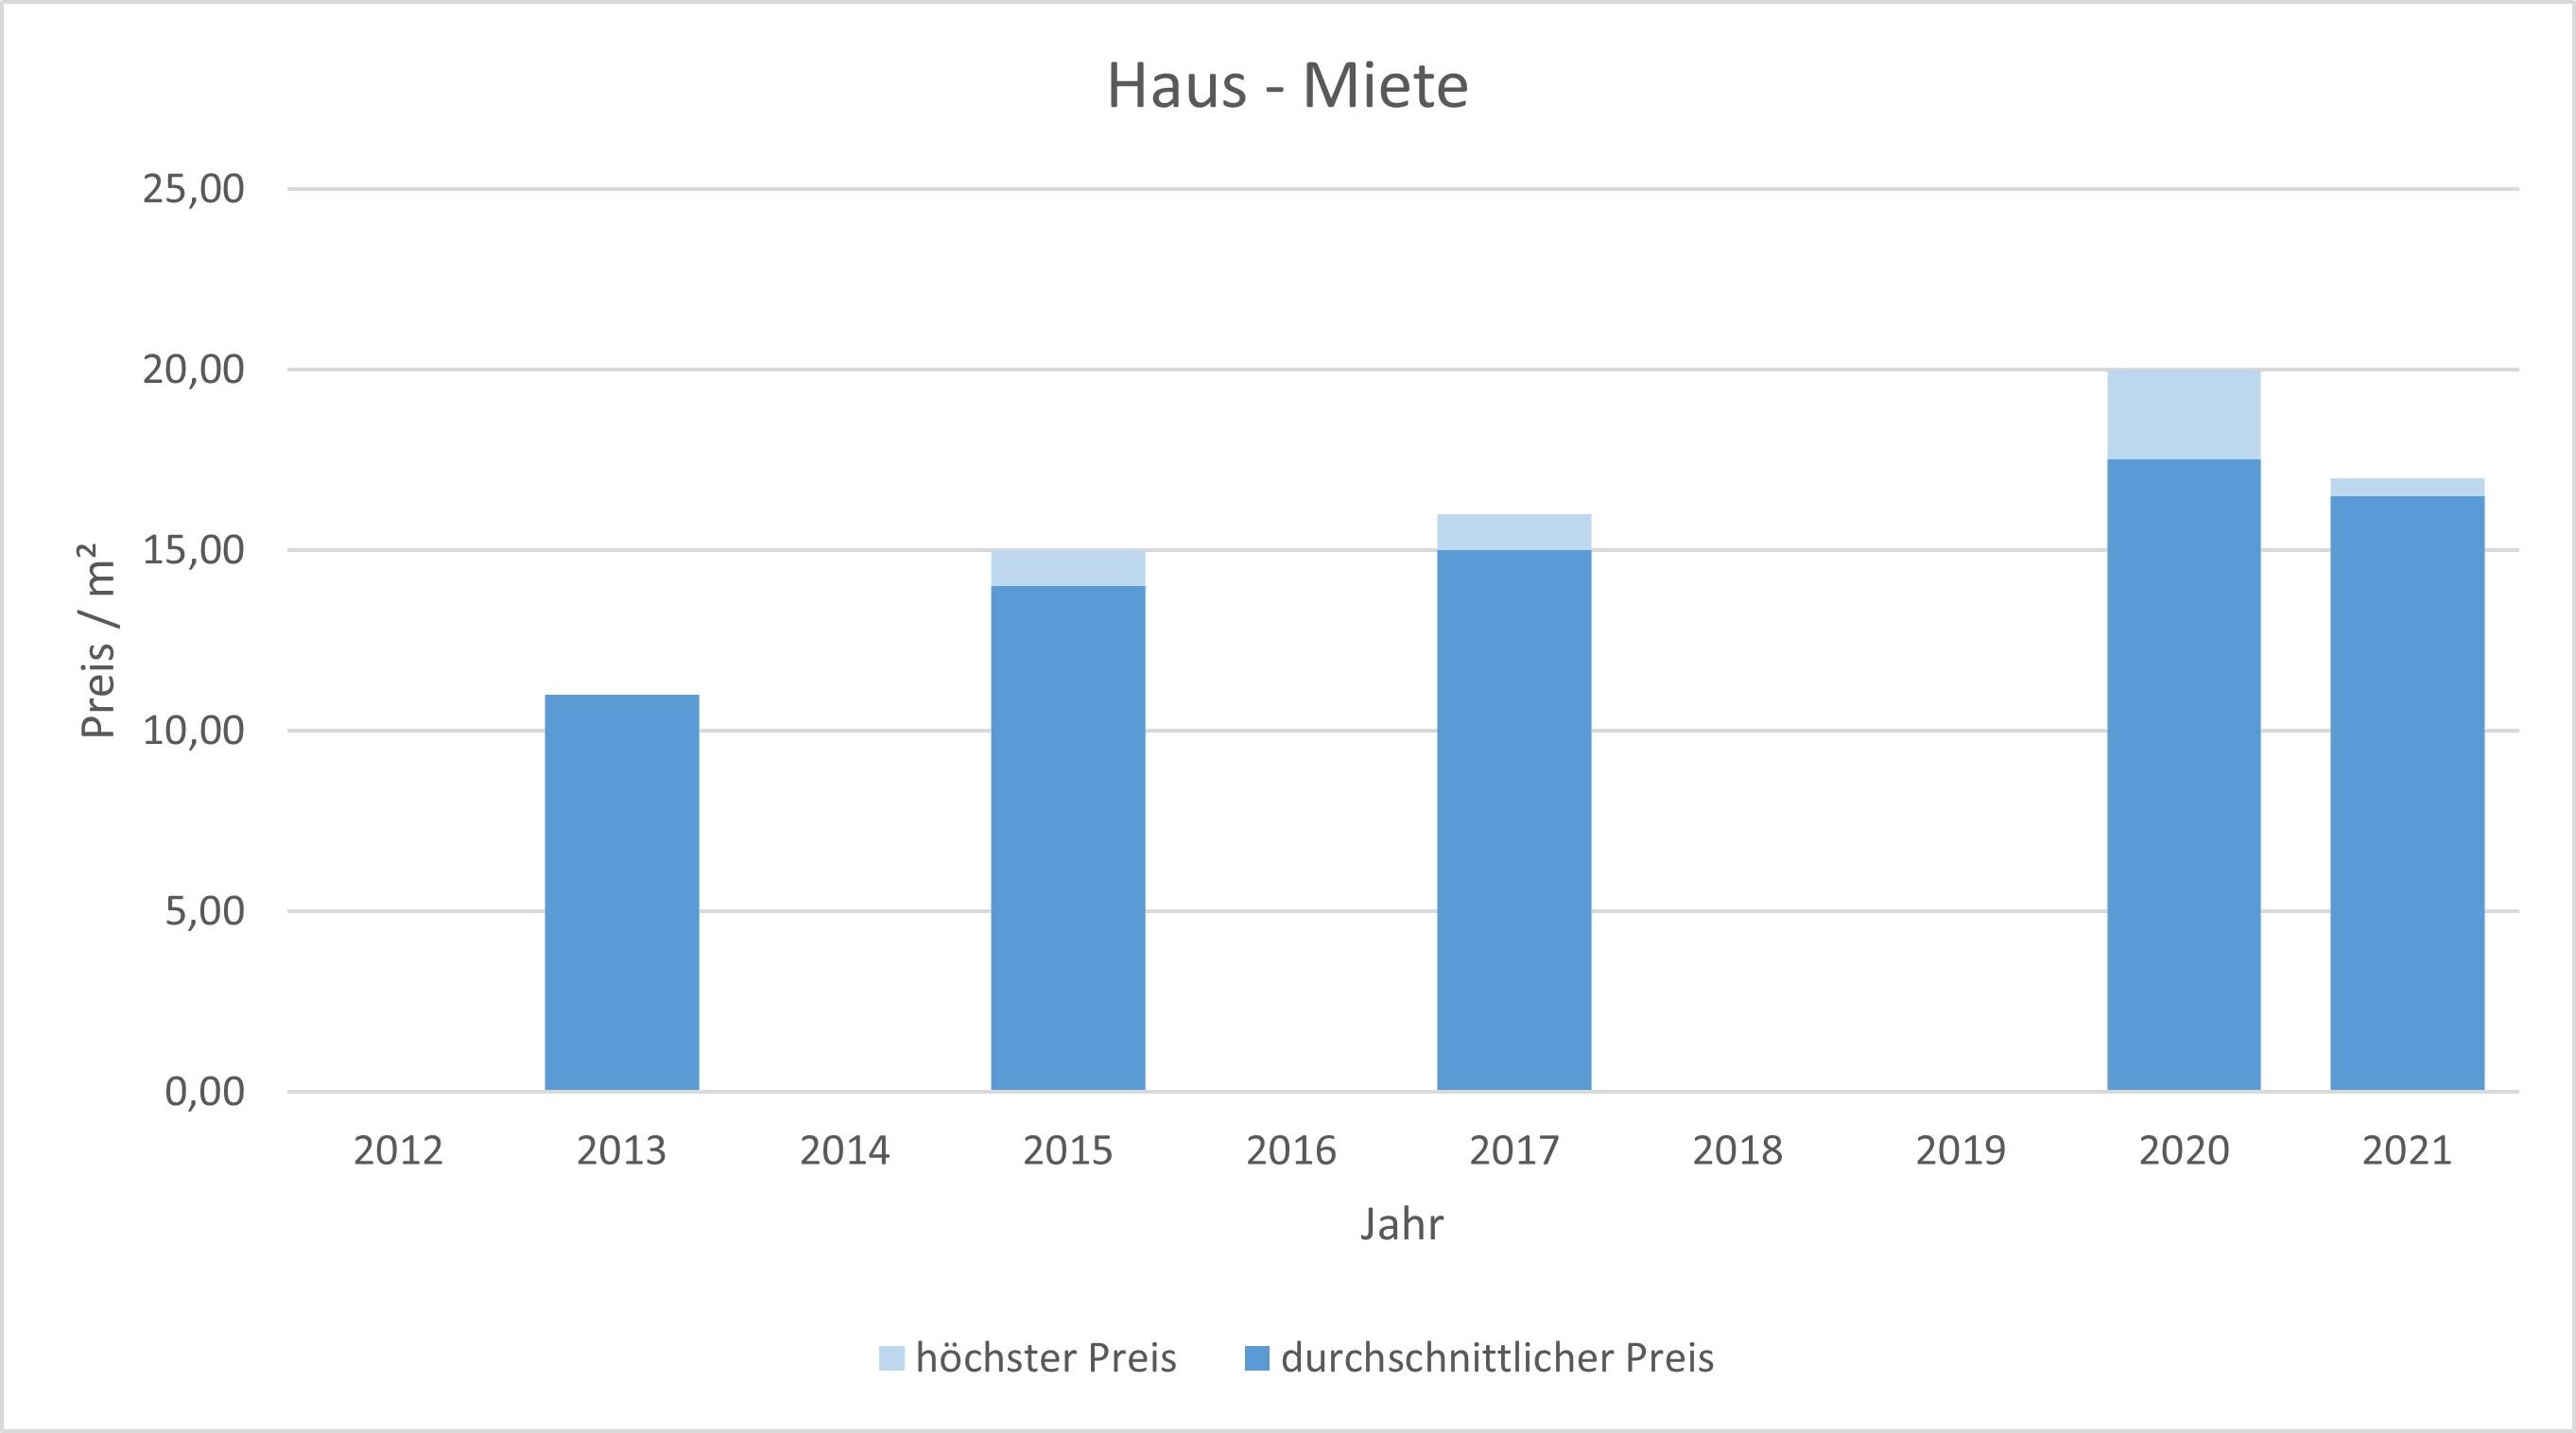 München - Fasangarten Haus mieten vermieten Preis Bewertung Makler 2019 2020 2021 www.happy-immo.de